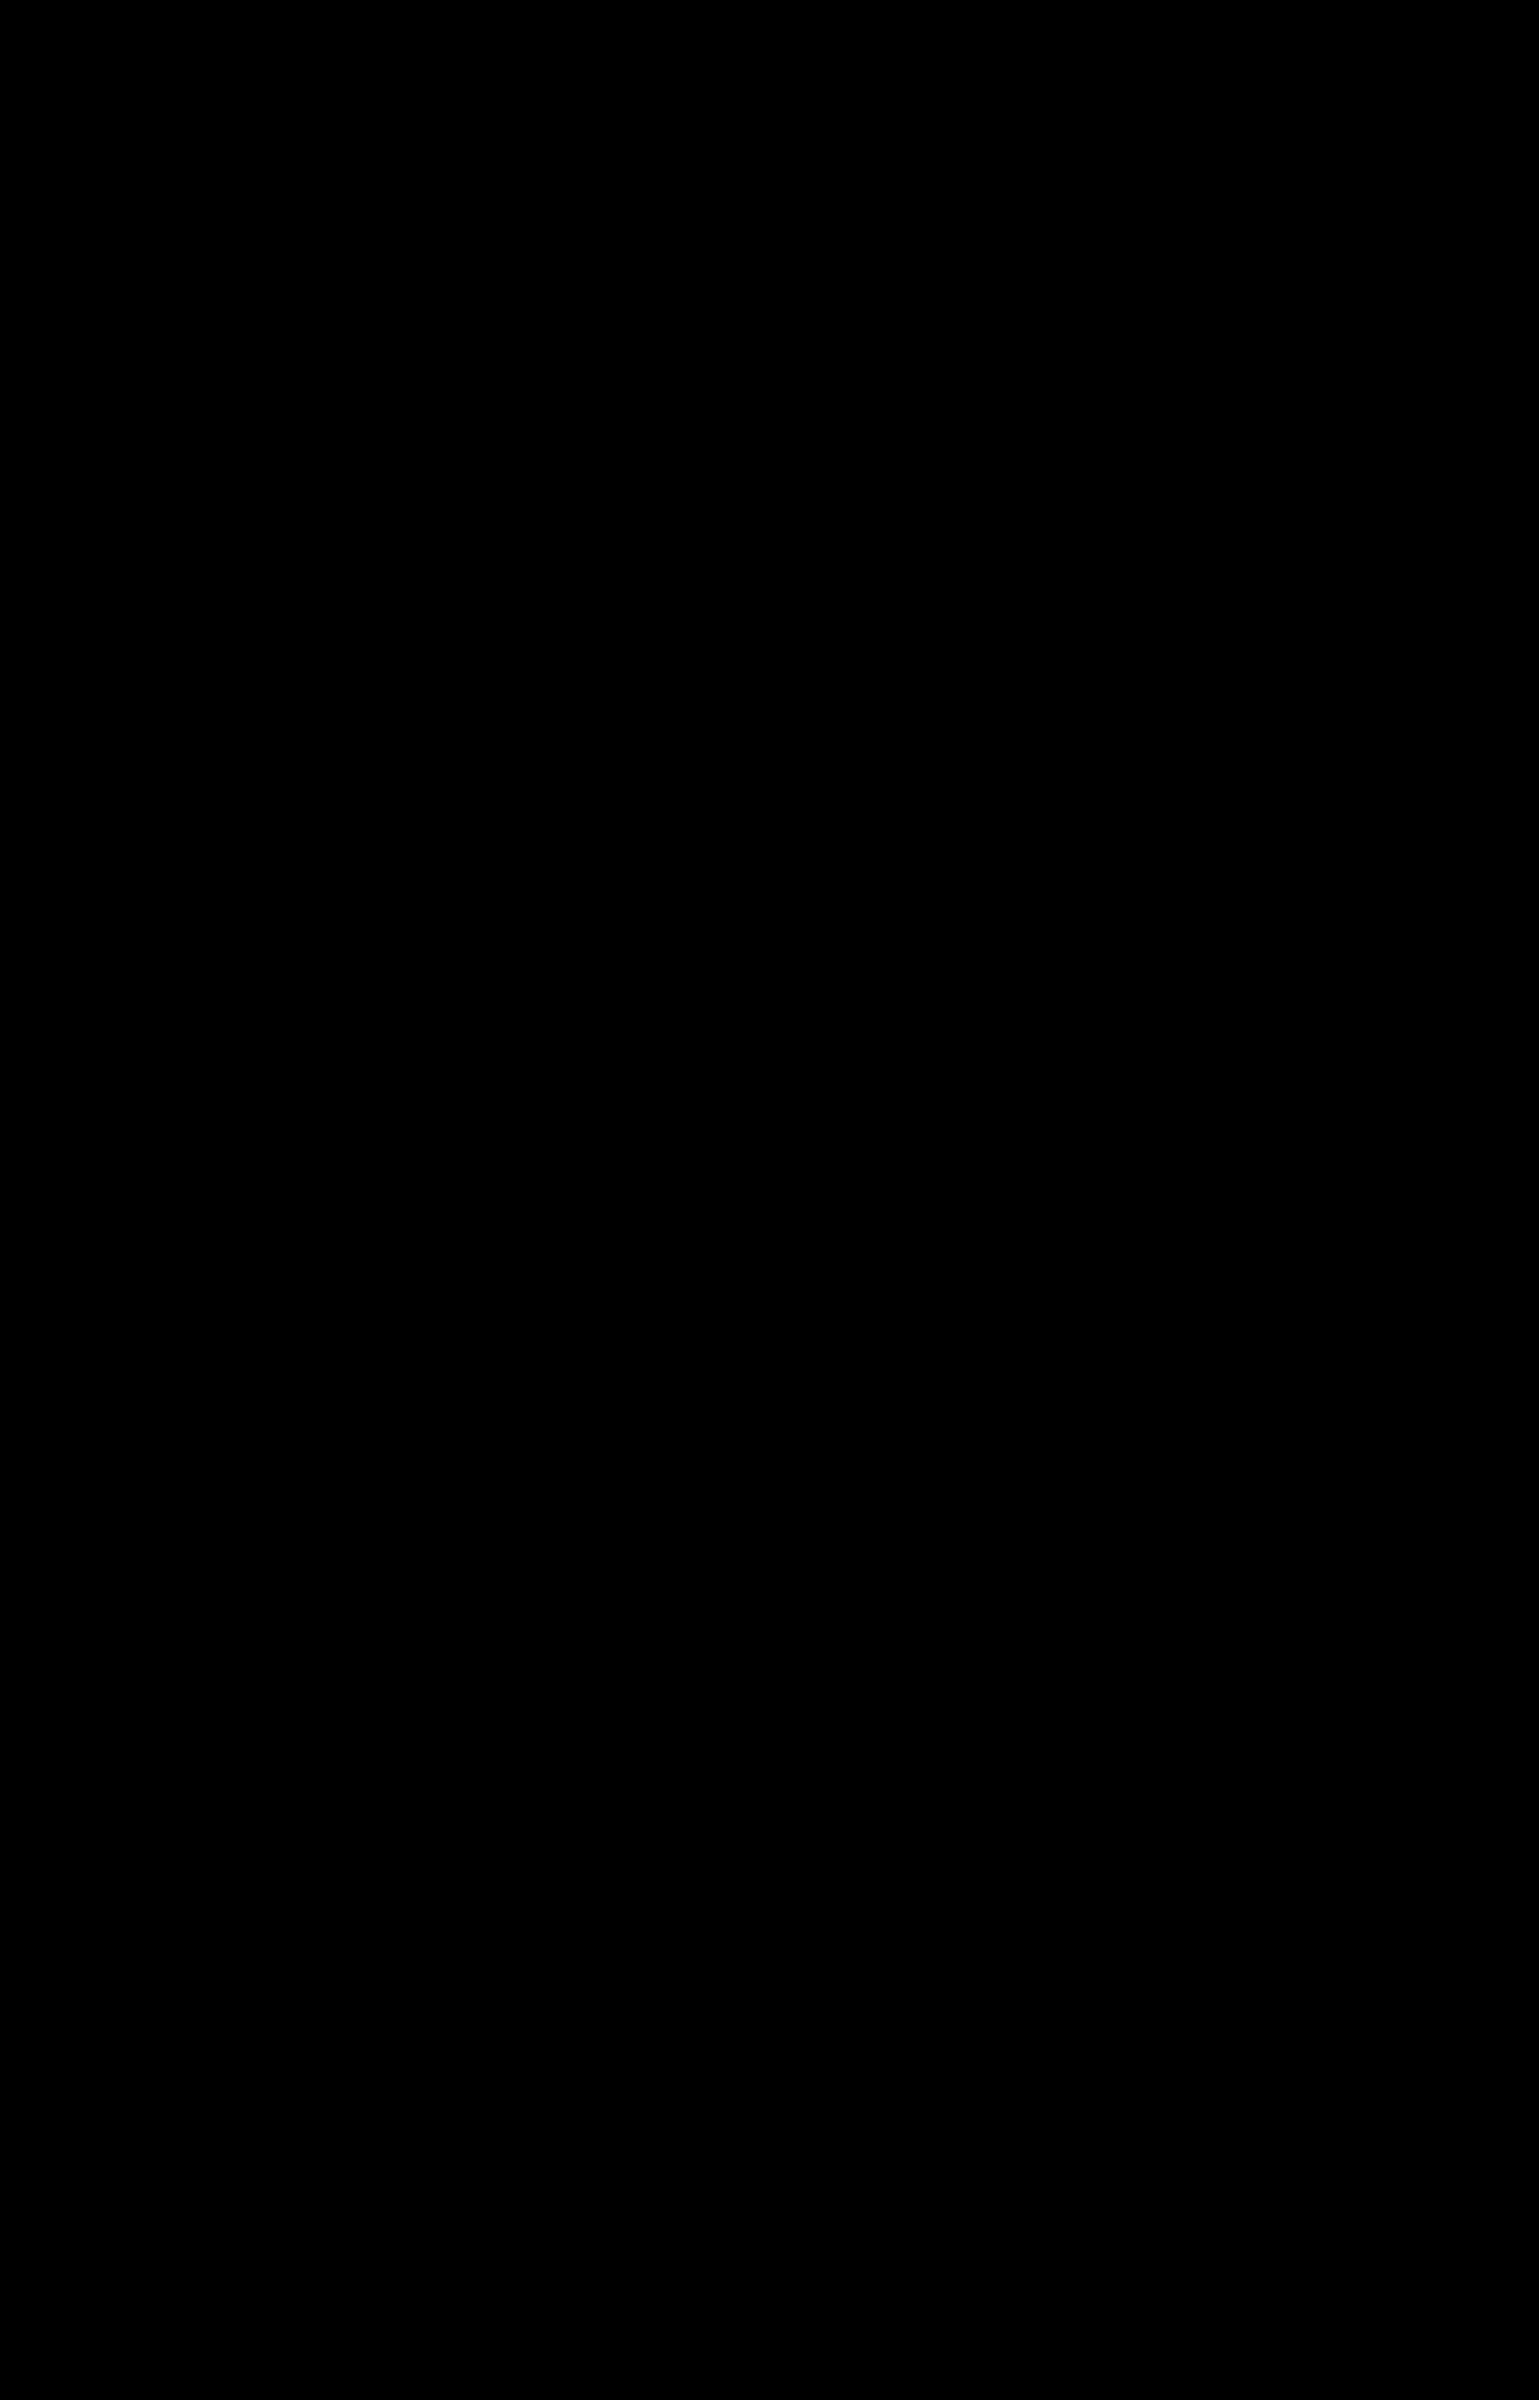 1539x2400 Pregnant Woman Silhouette Clipart